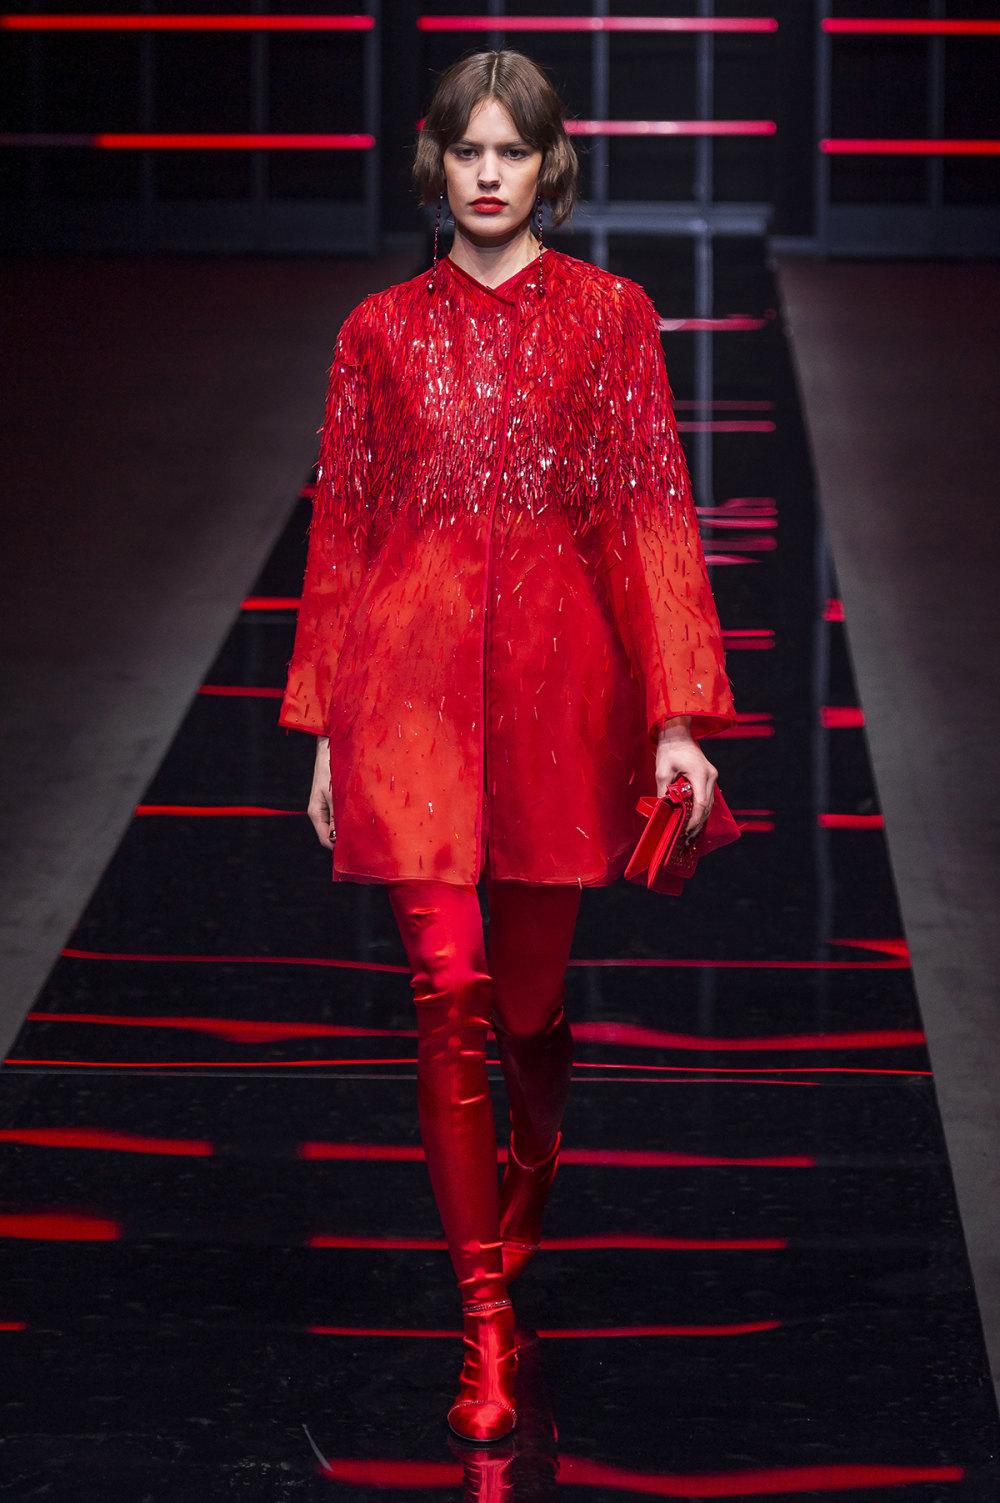 Emporio Armani时装系列畅的裤子带有柔滑裙子的鸡尾酒礼服-71.jpg